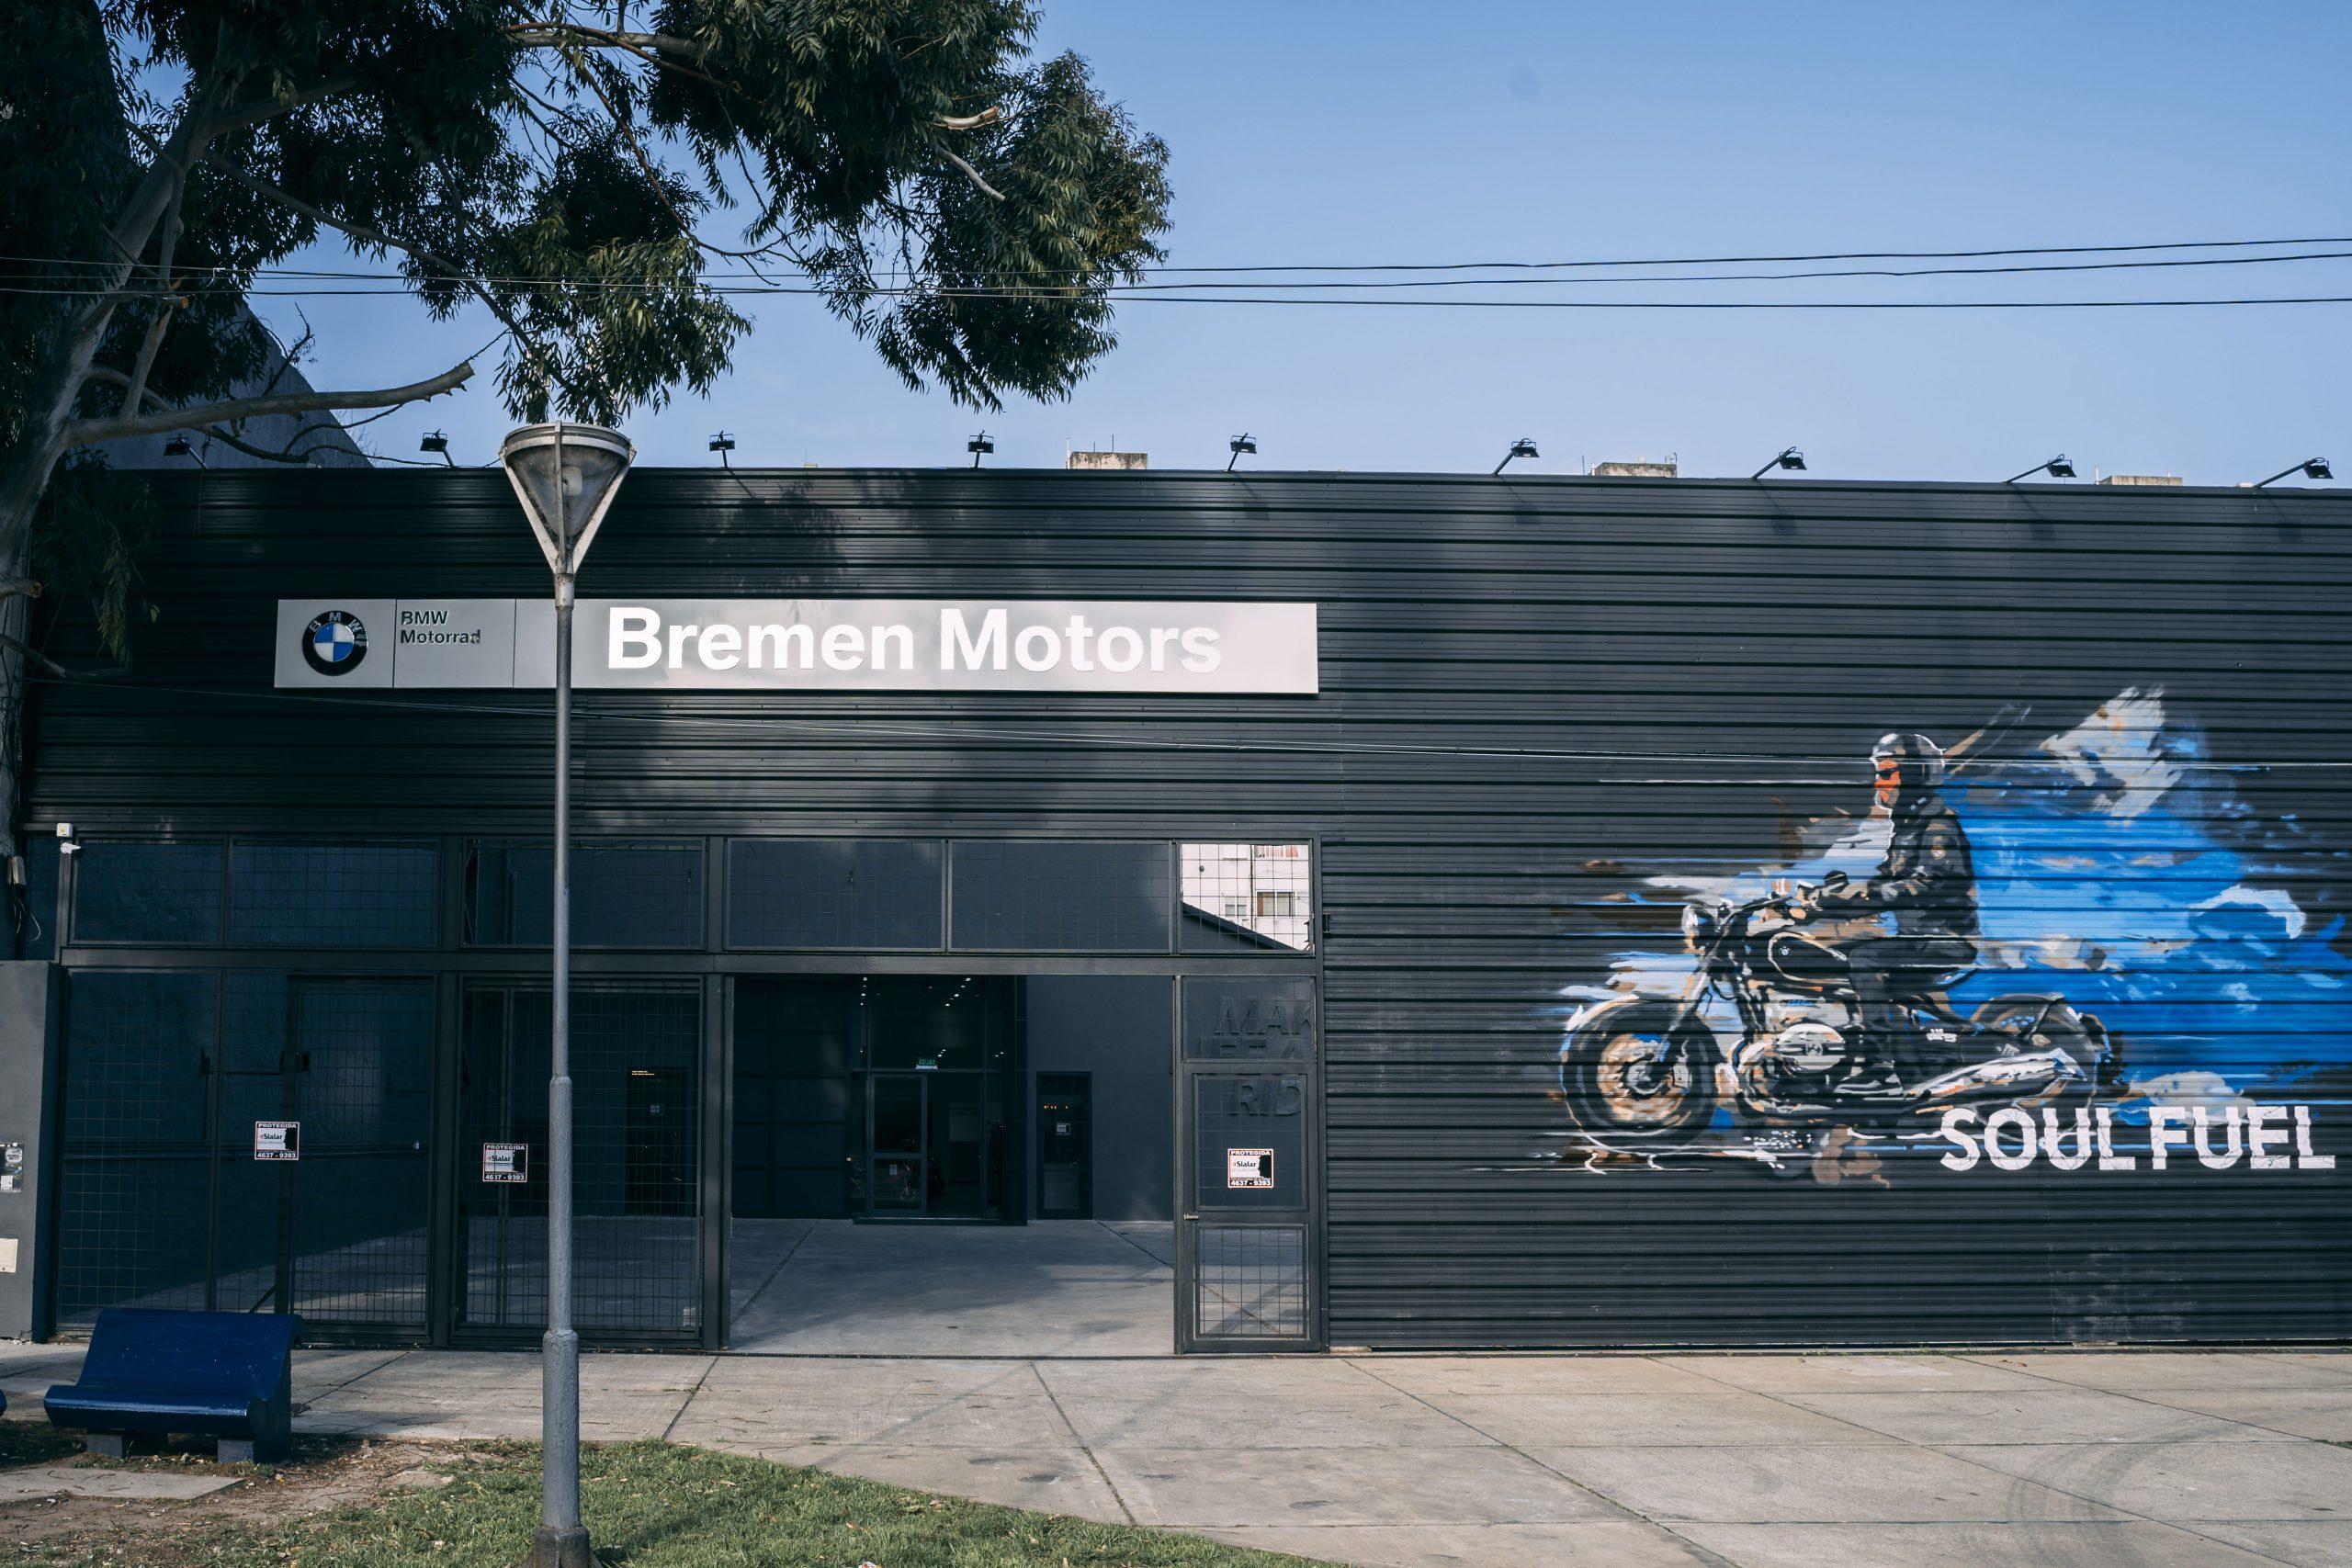 BMW MOTORRAD 1 scaled